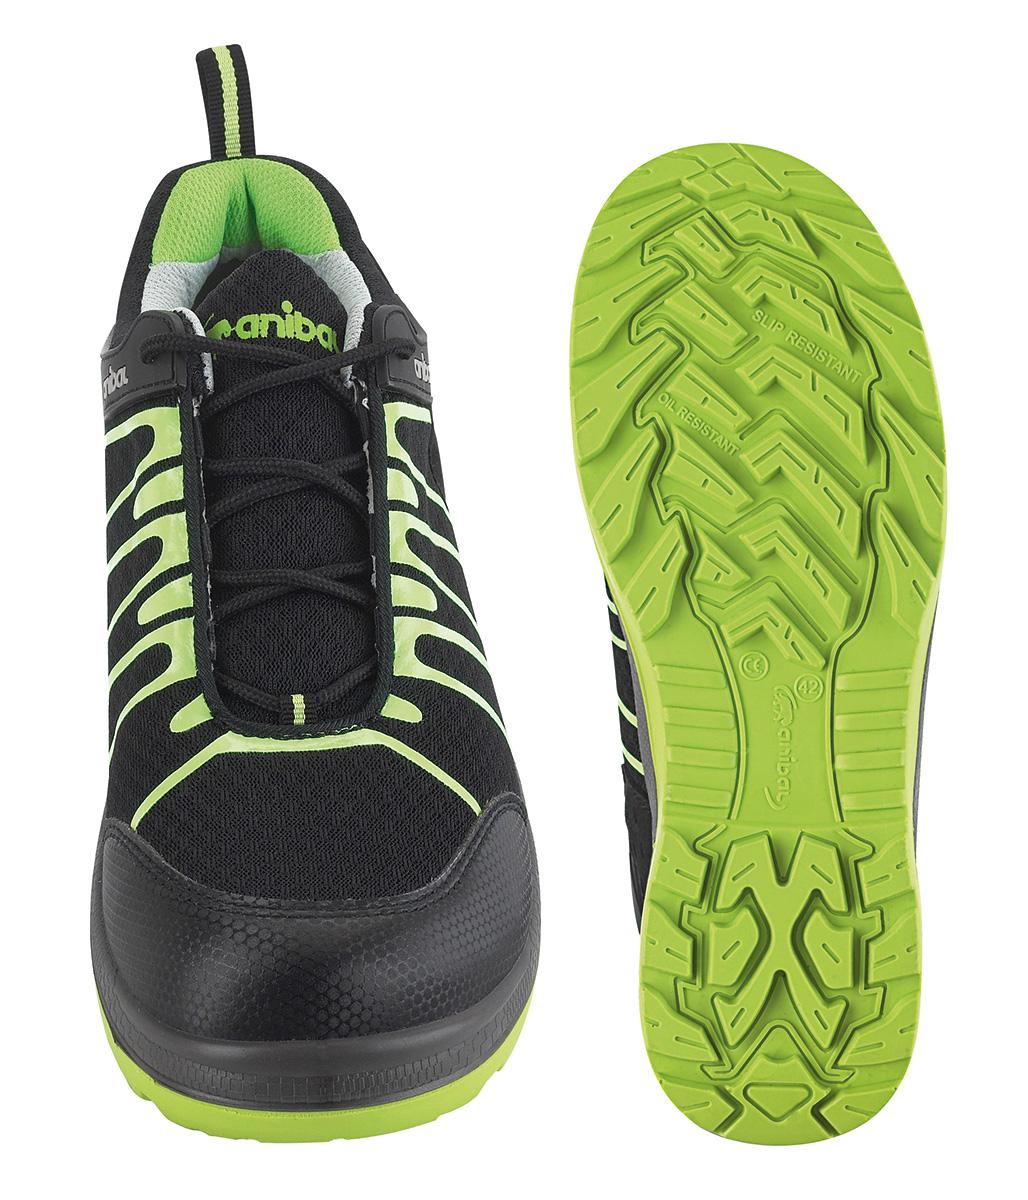 2f53c5374fc 1688-ZUF PRO Calzado de Seguridad Plus Ultra-Ligth Metal Free Zapato mod.